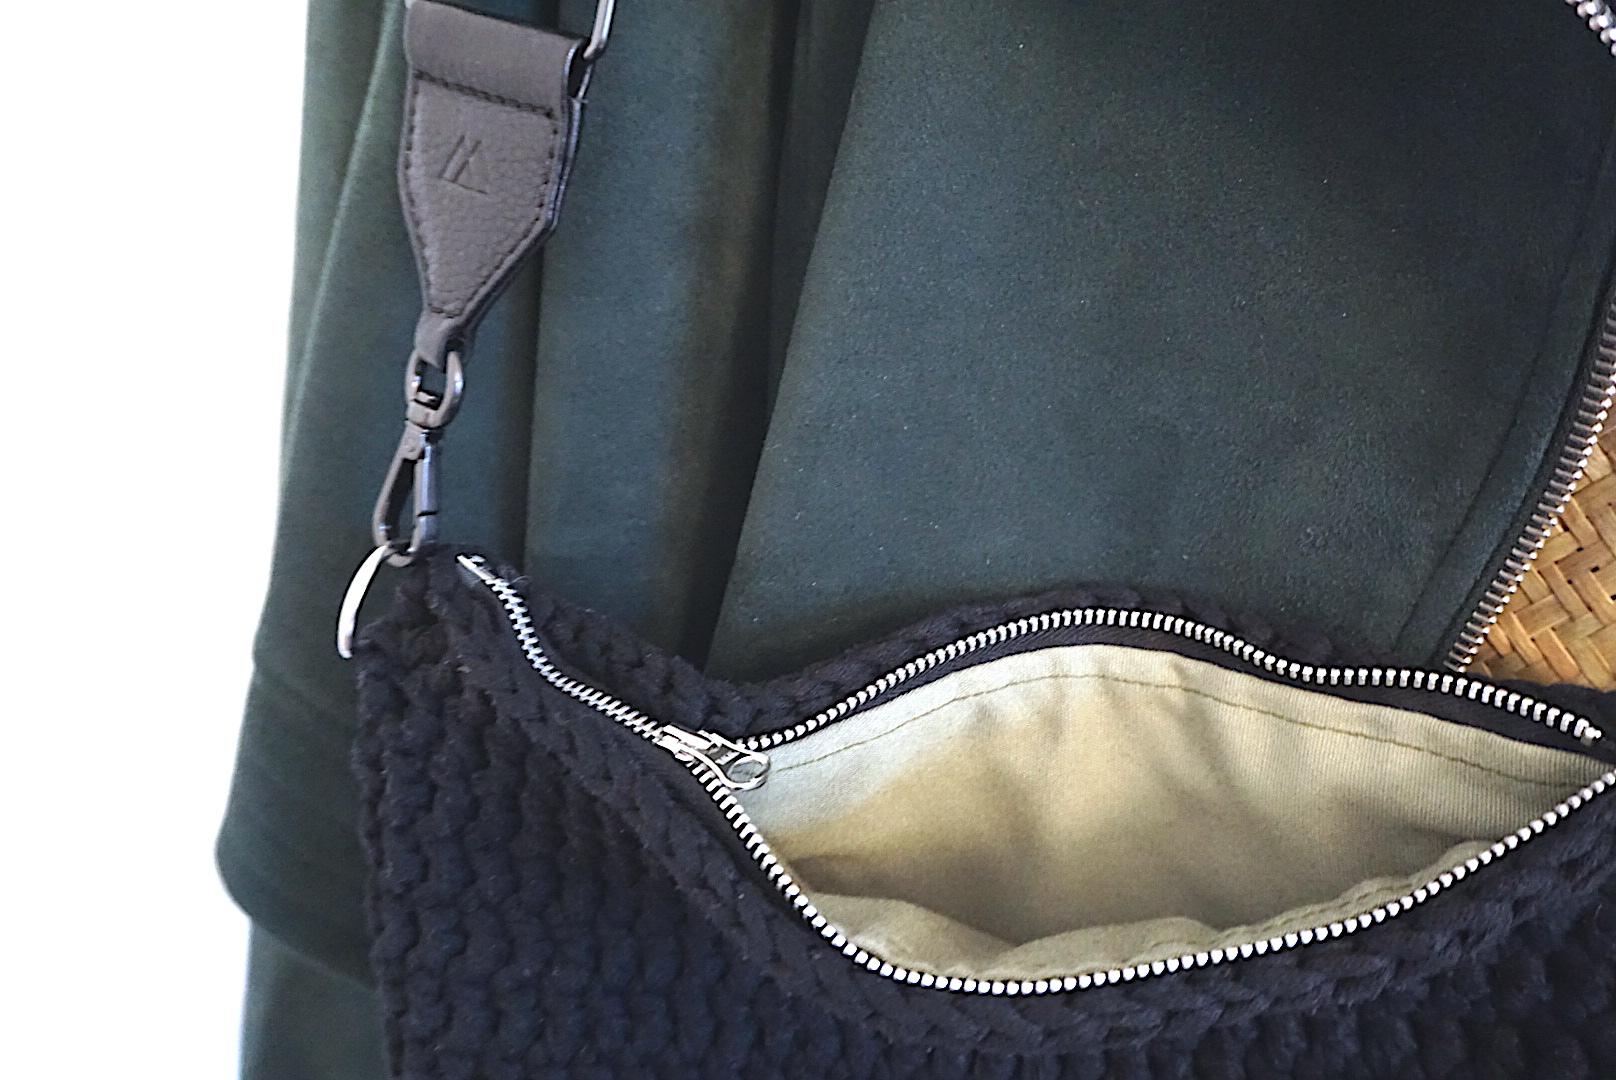 Hæklet taske - Mayflower båndgarn - Markberg Guitar strap